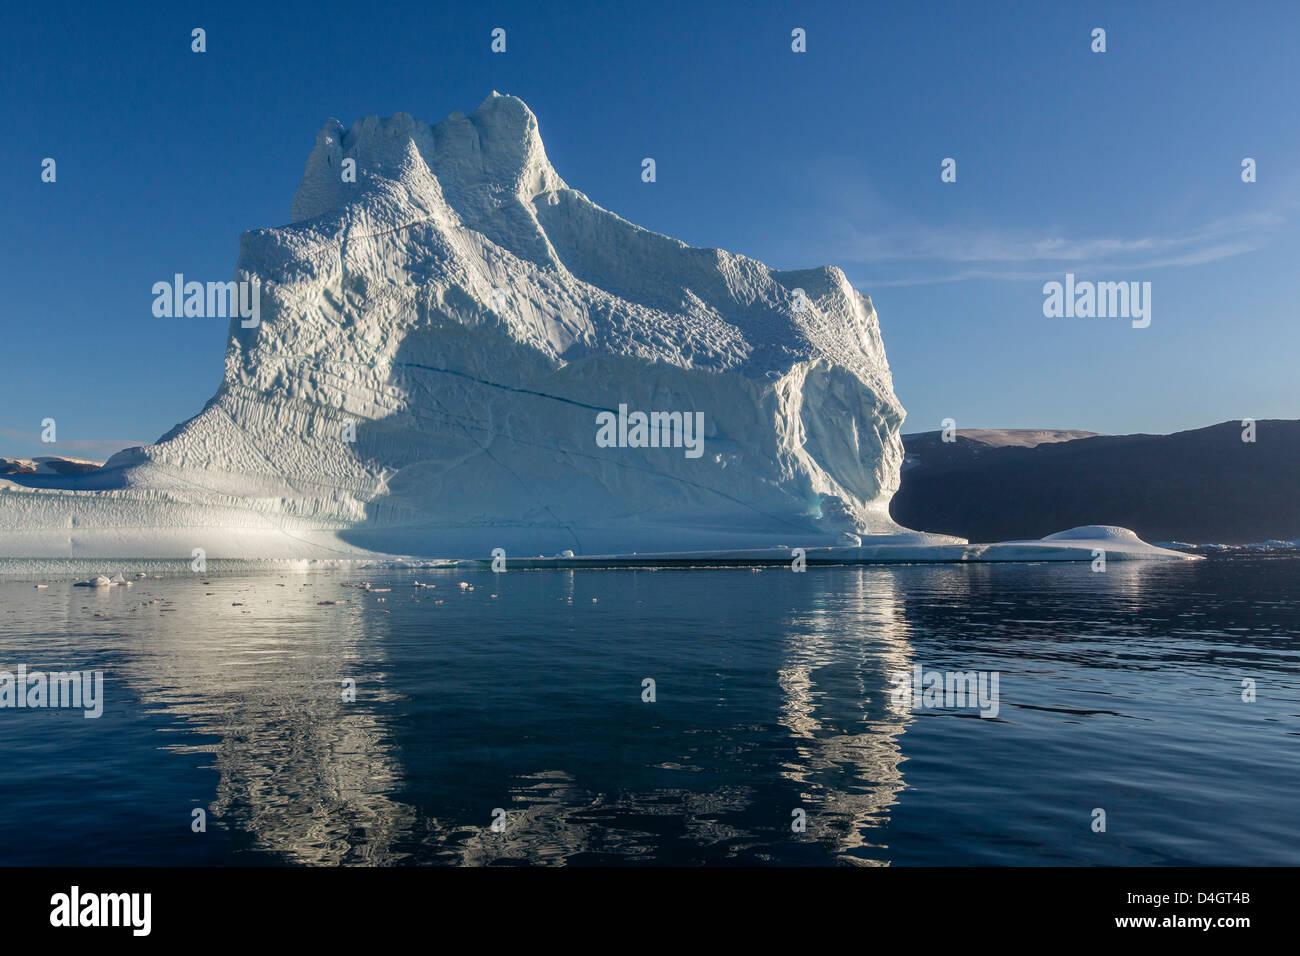 Grounded icebergs, Rode O (Red Island), Scoresbysund, Northeast Greenland, Polar Regions - Stock Image